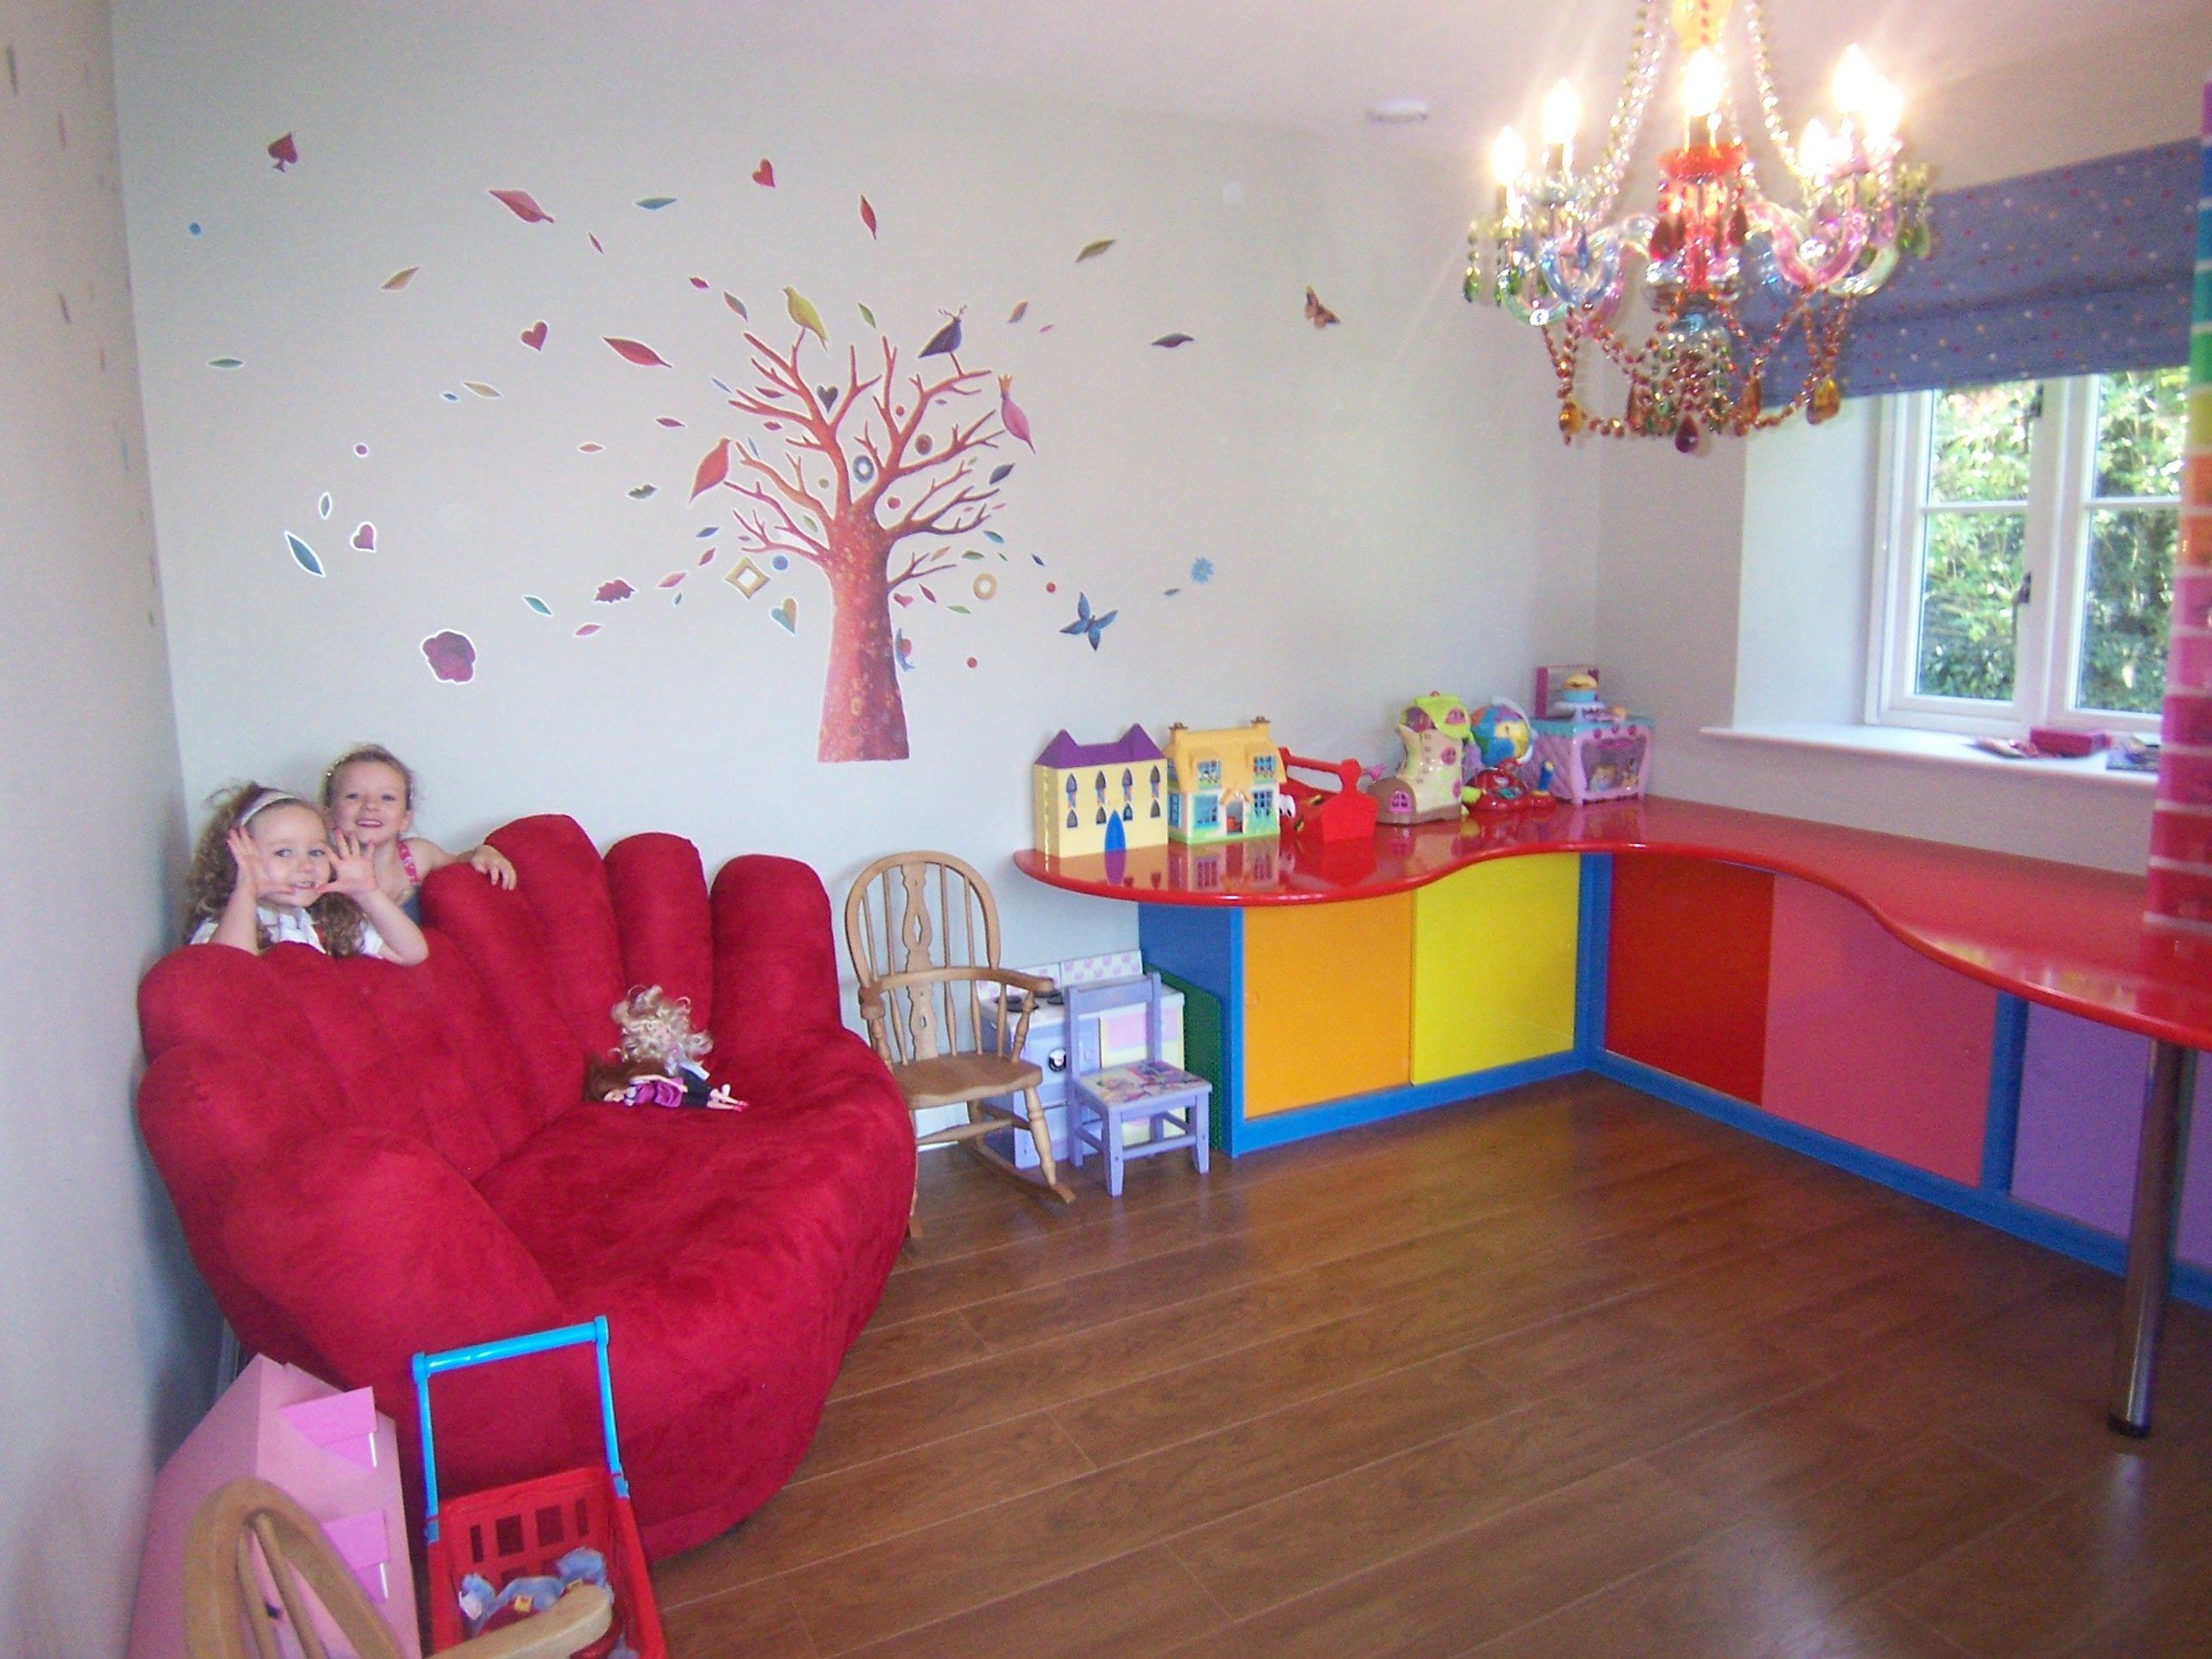 Childrens Bedroom Wall Designs Pleasing Unique Playroom Ideas  Baby And Children's Room Interior Design Design Decoration